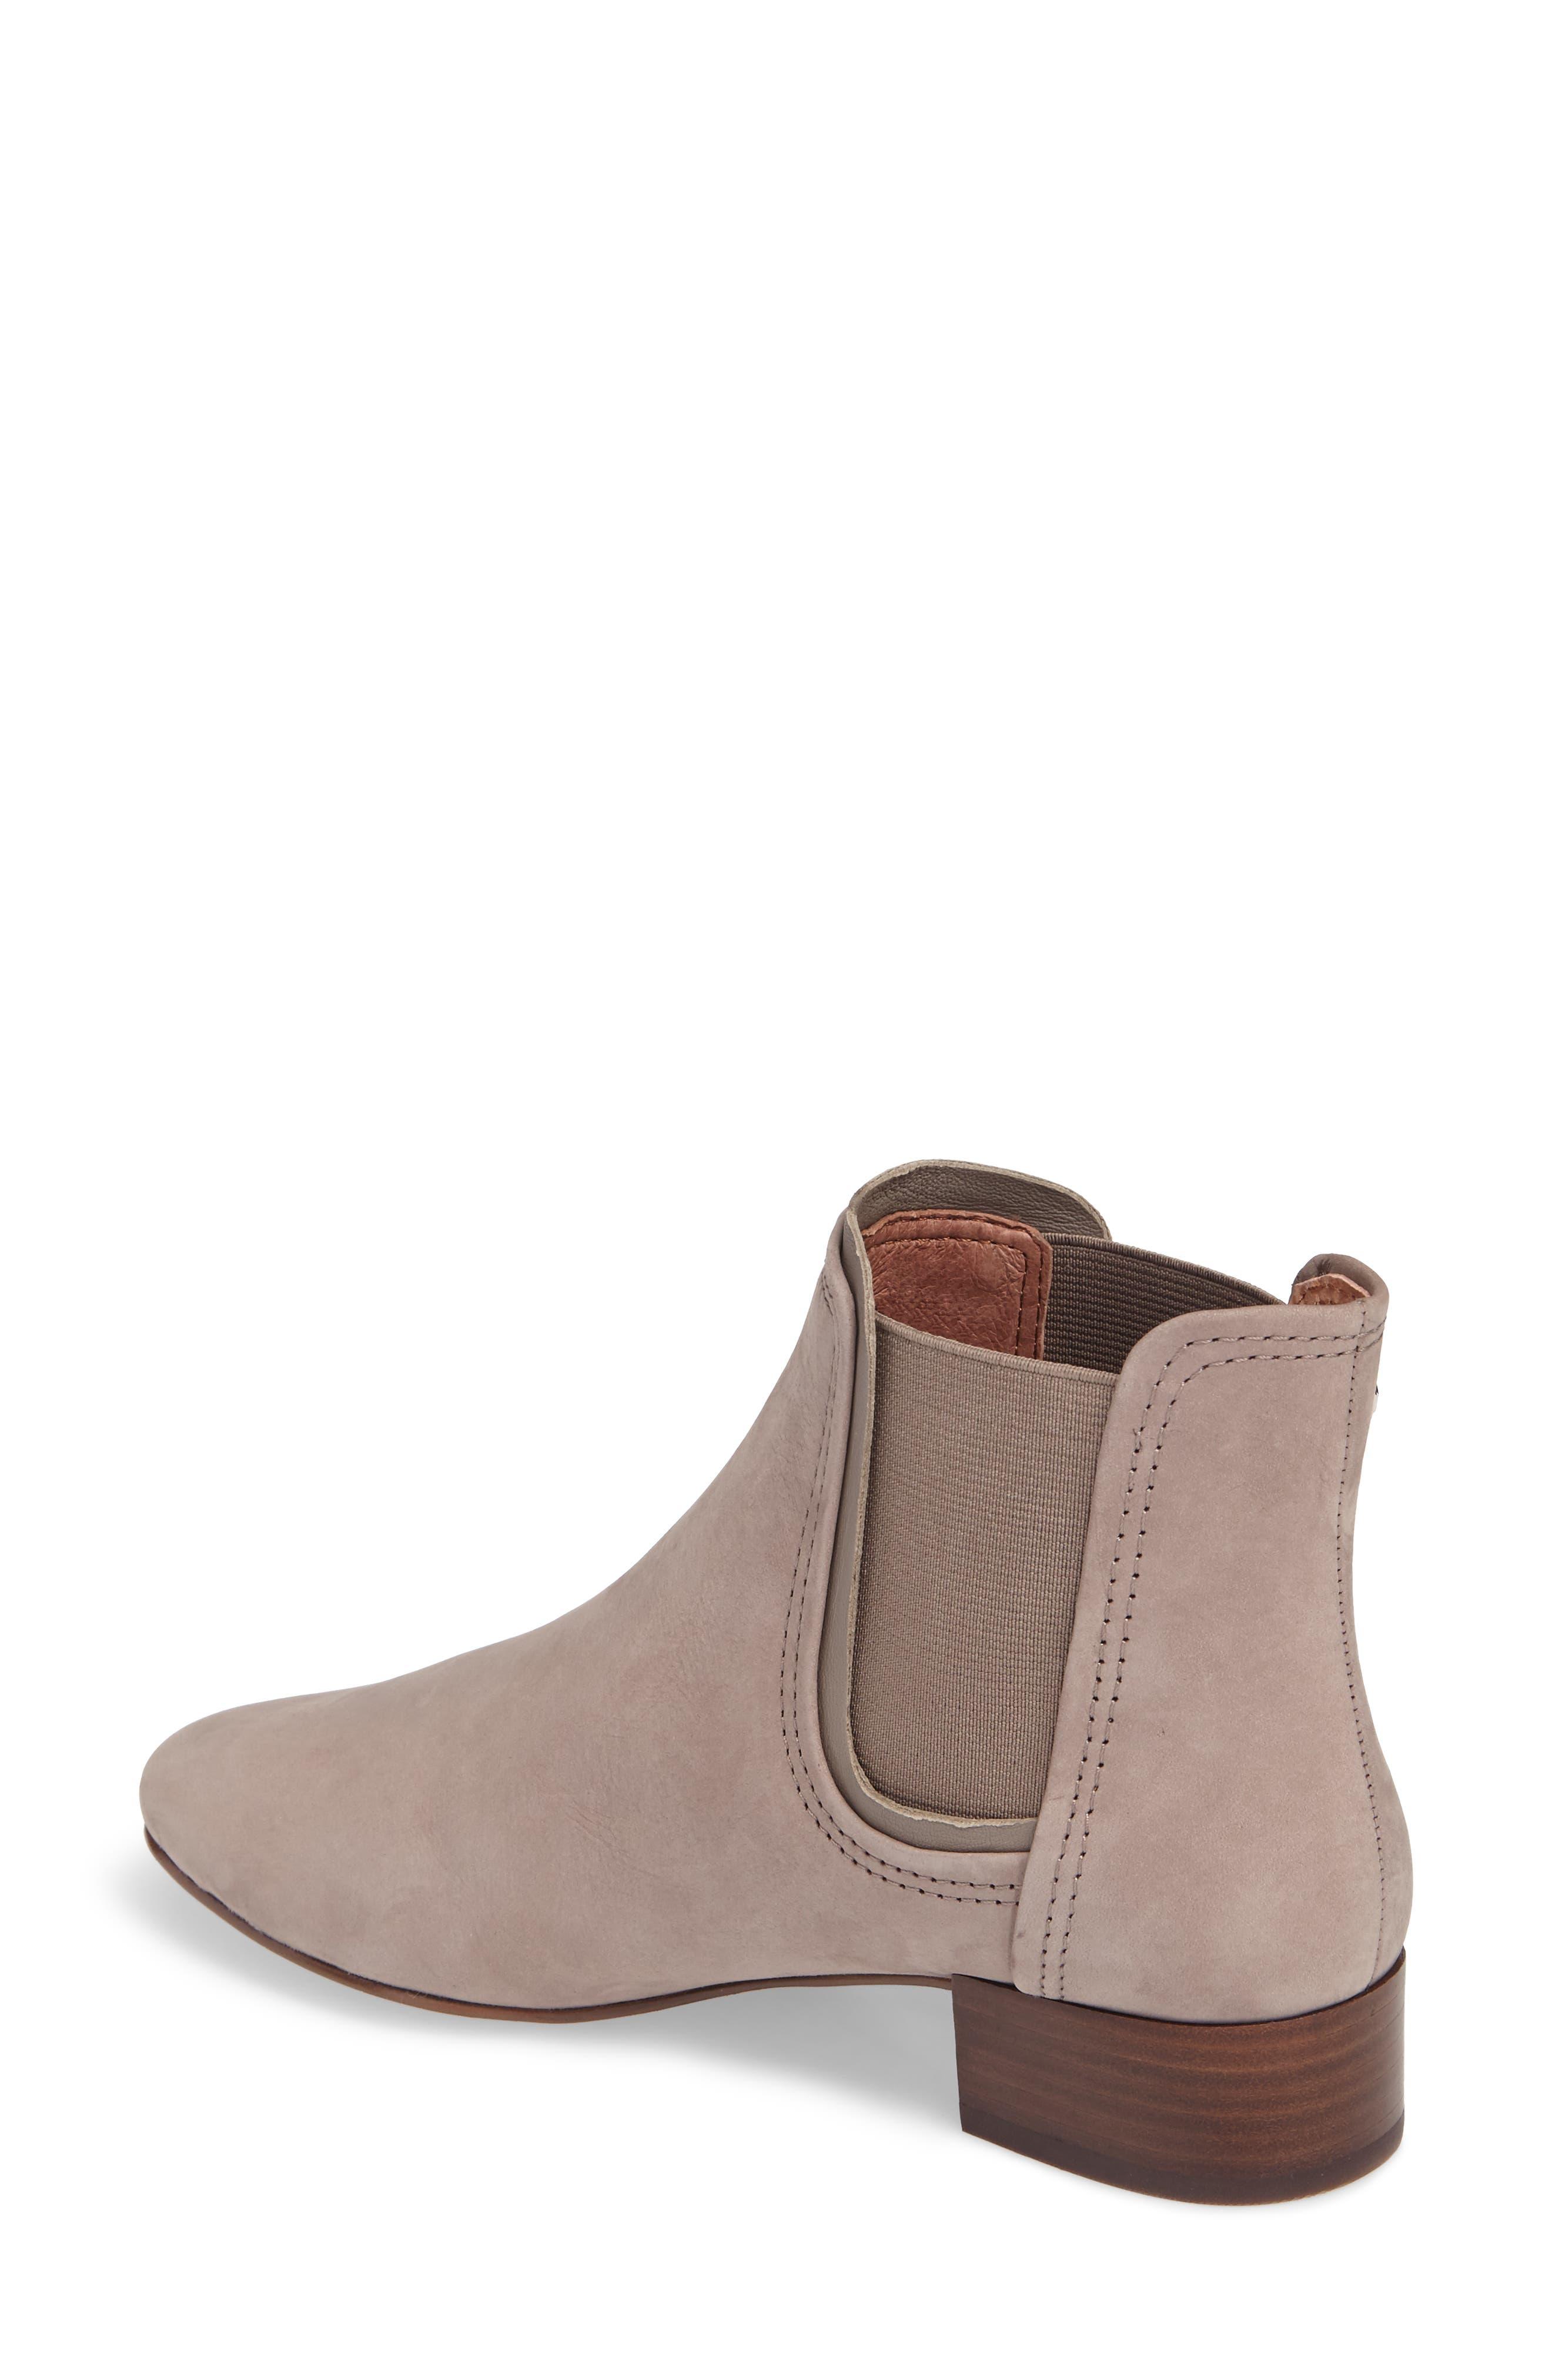 Waldon Chelsea Boot,                             Alternate thumbnail 2, color,                             Gravel Leather